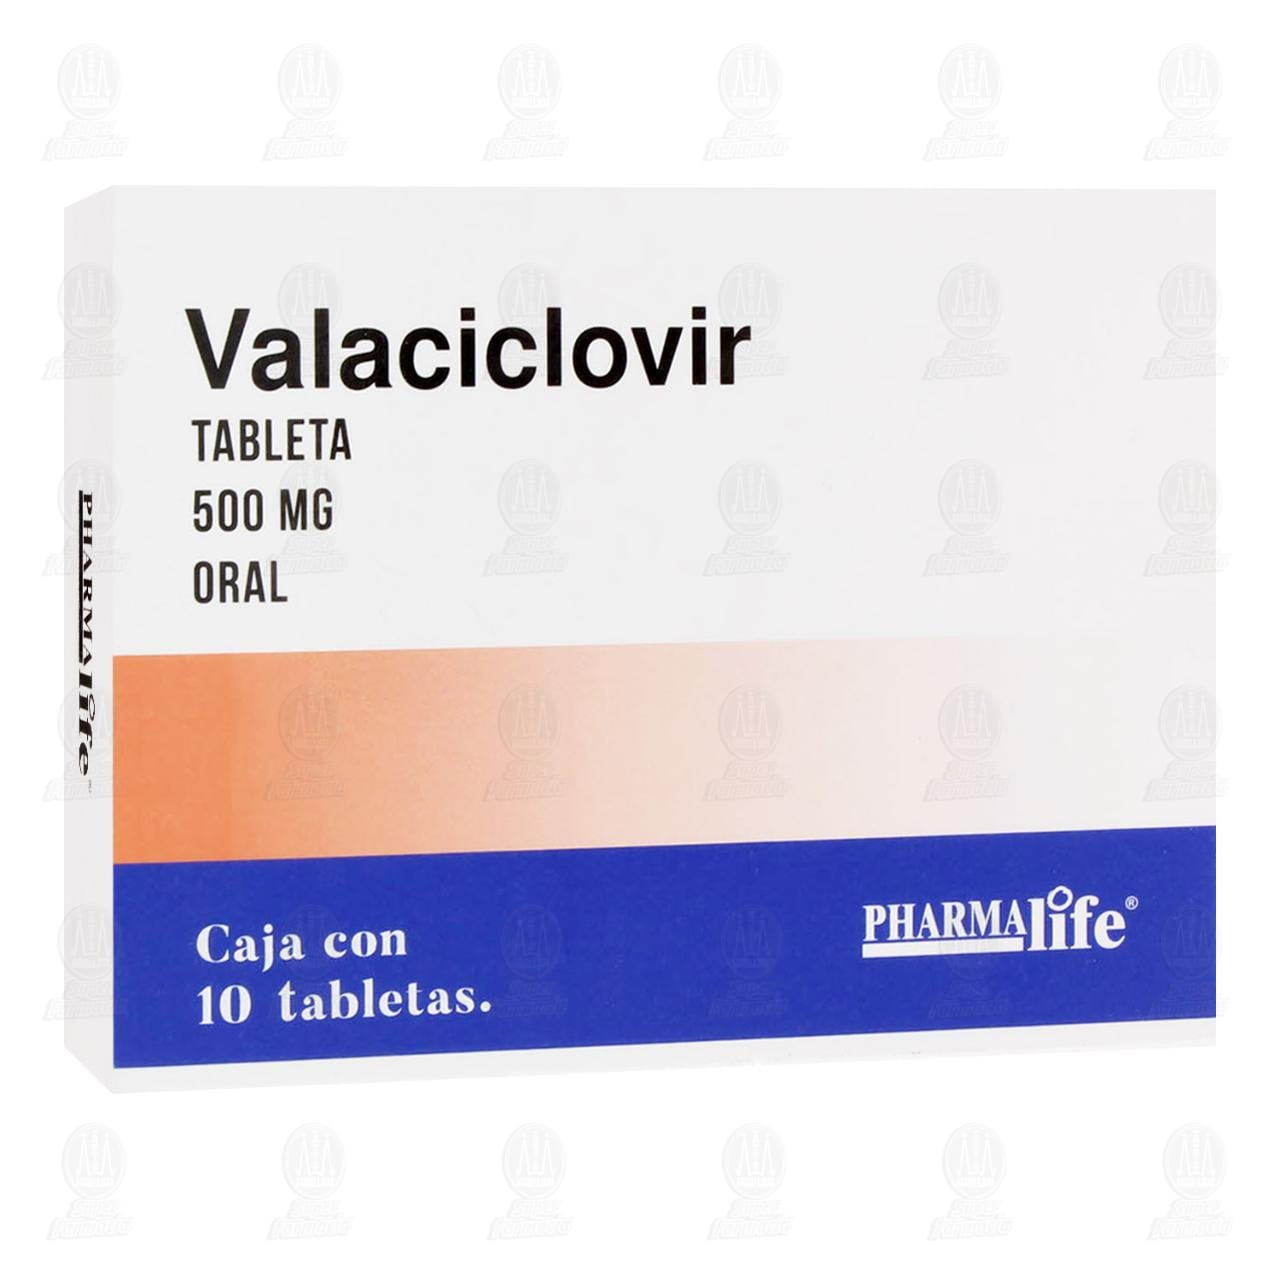 Comprar Valaciclovir 500mg 10 Tabletas Pharmalife en Farmacias Guadalajara